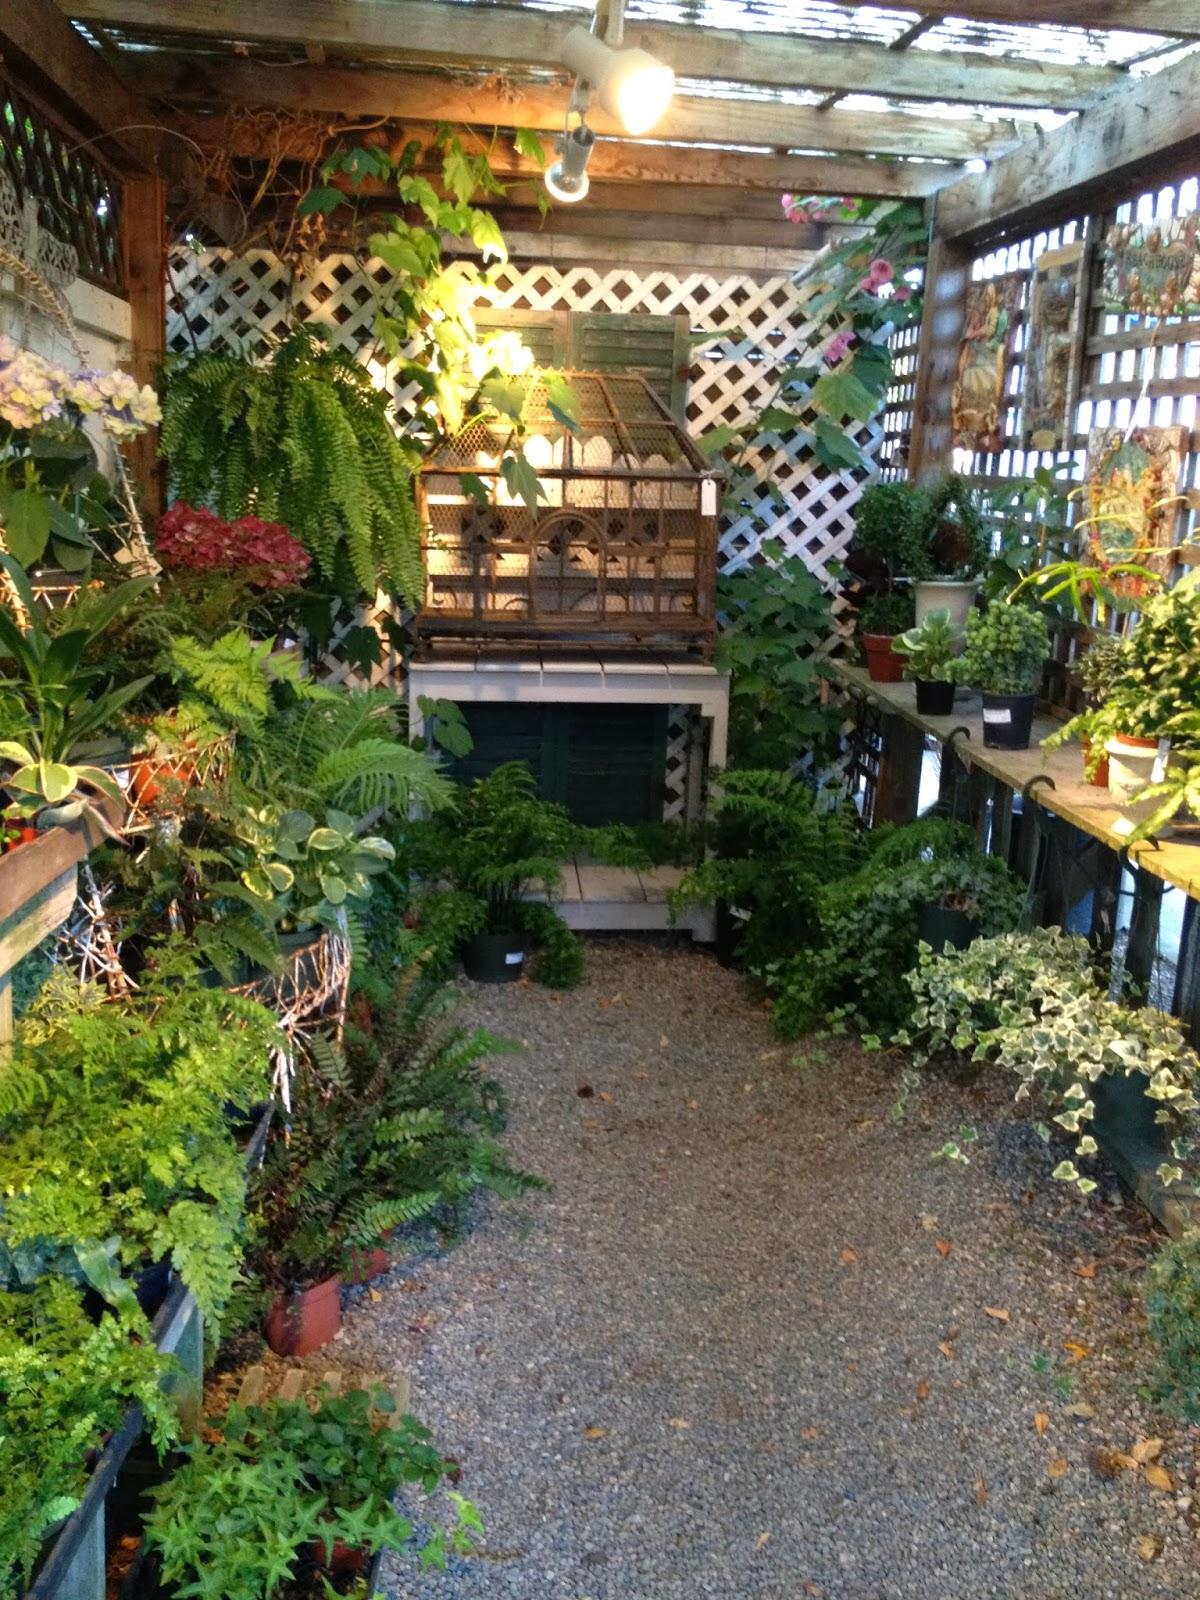 vignette design: Wisteria Antiques And Gardens